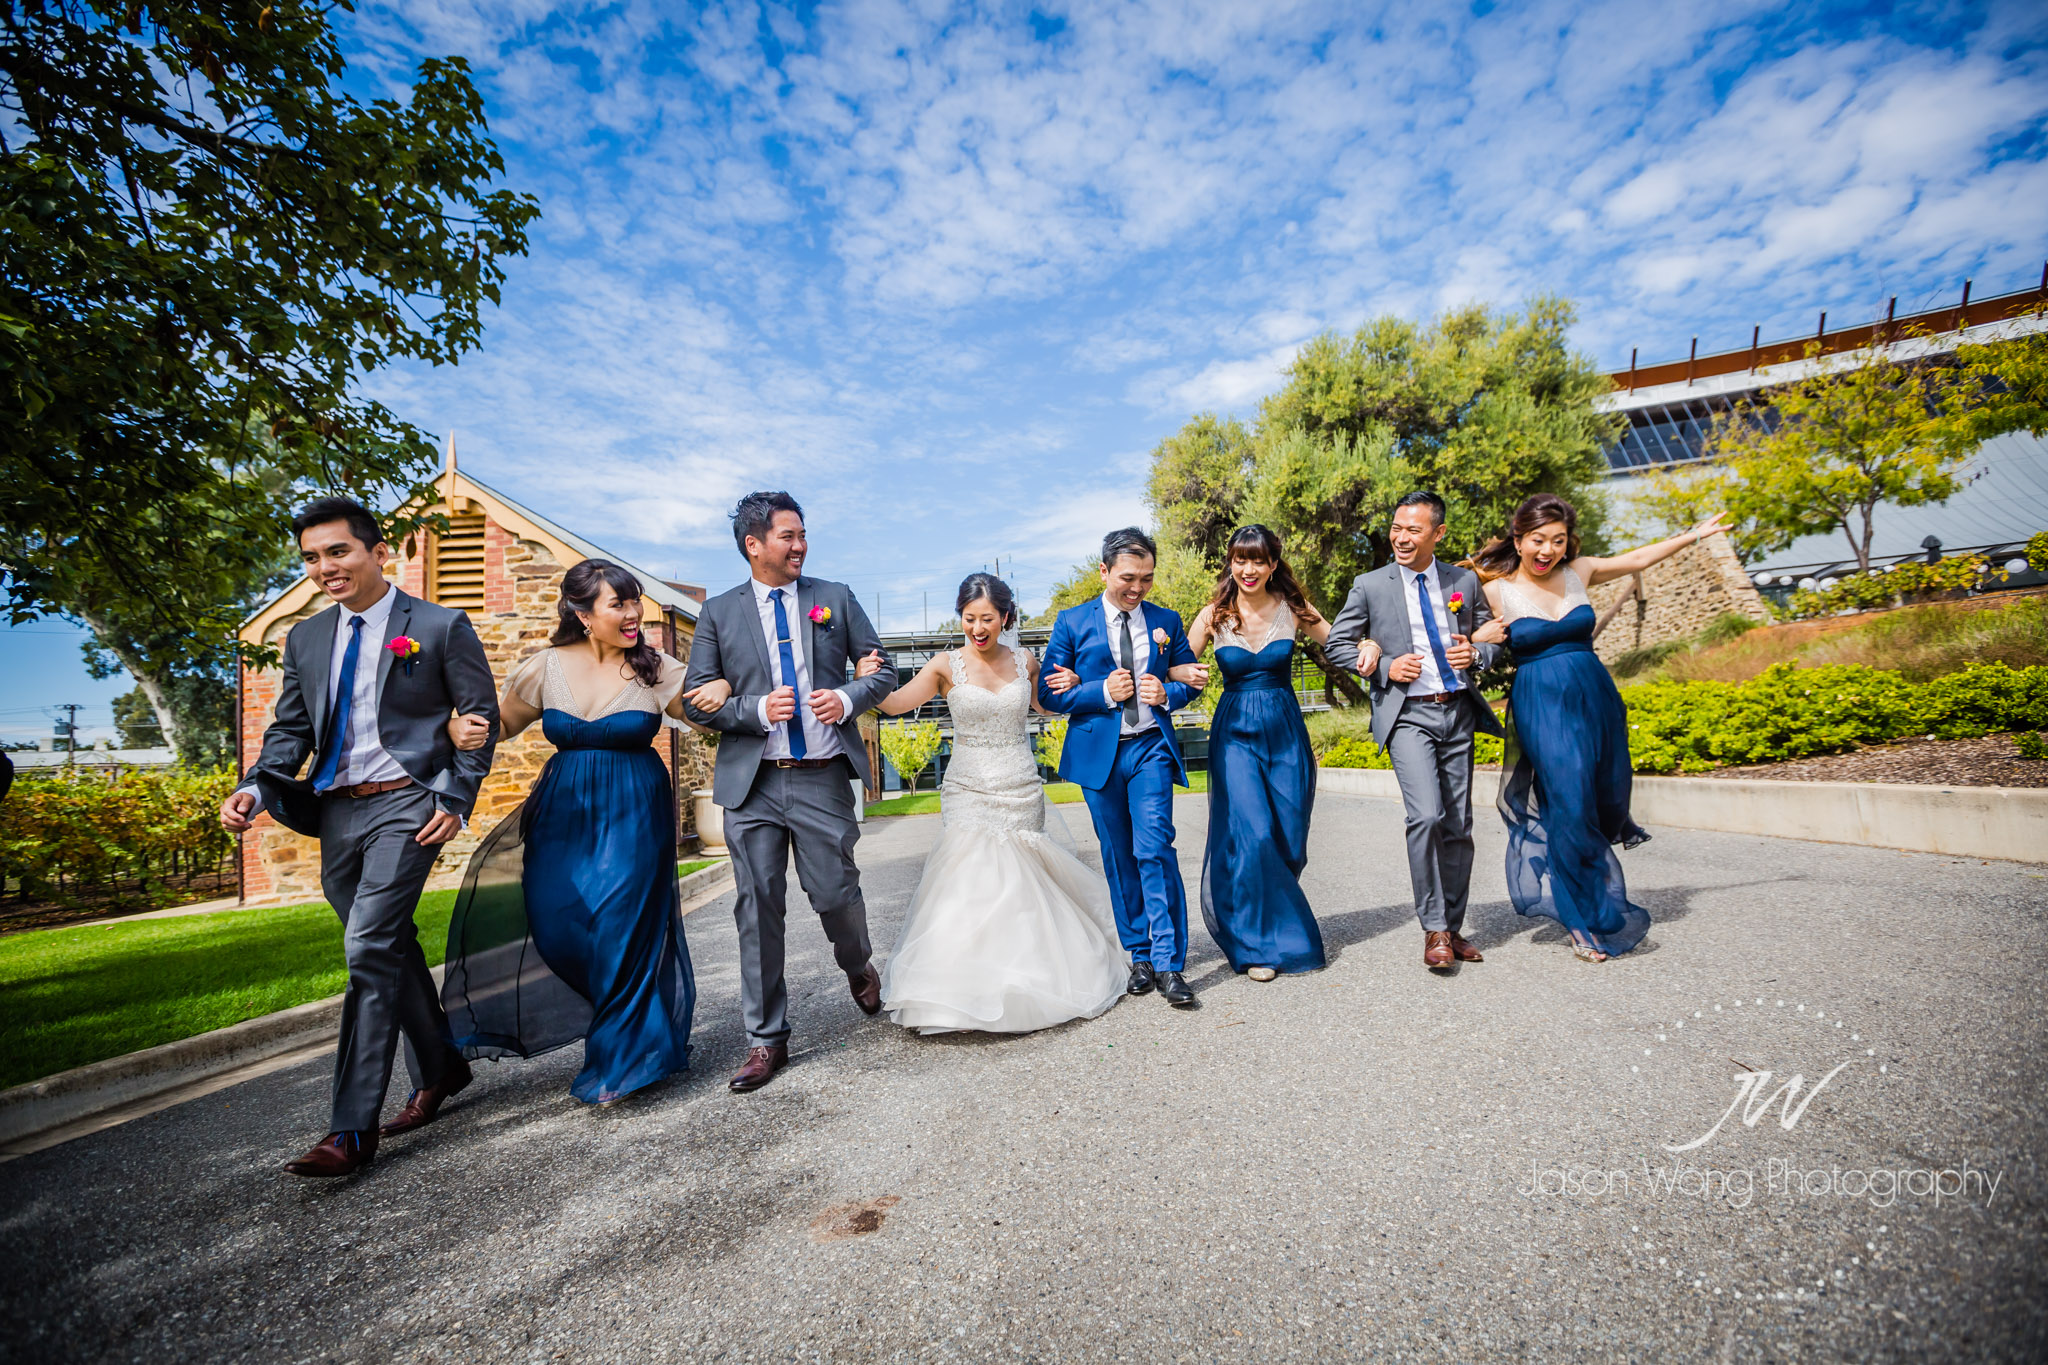 bridal-party-having-walk-photoshoot.jpg